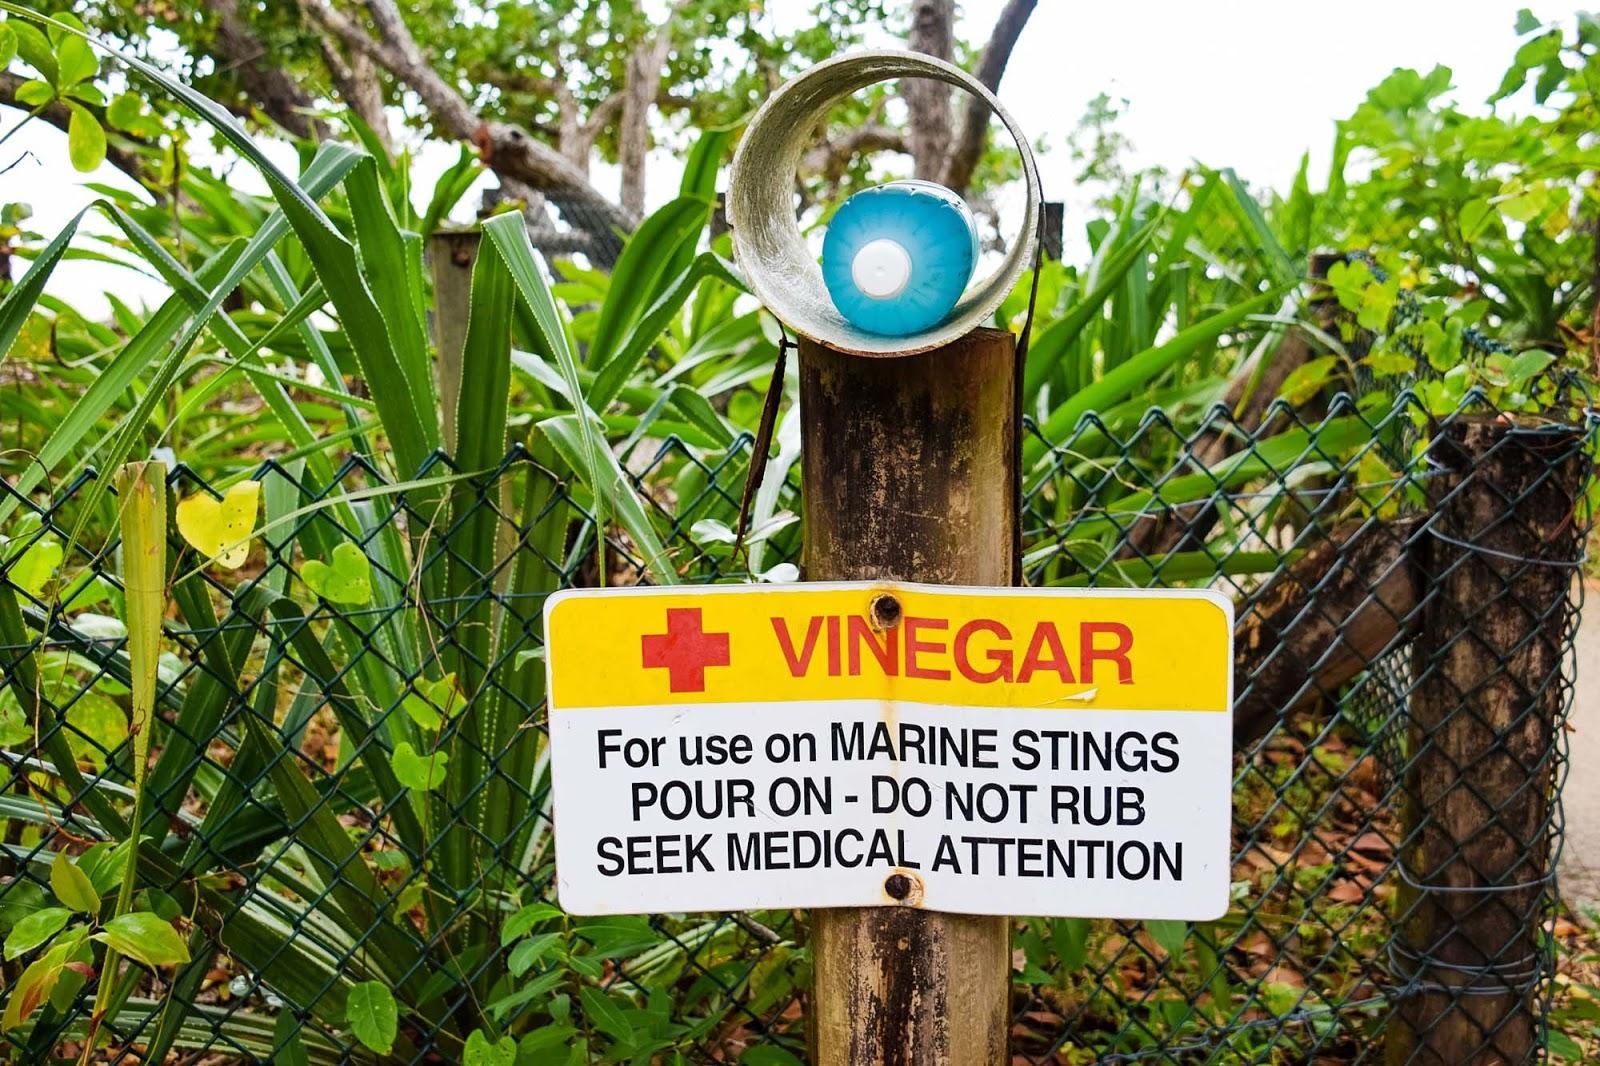 beach vinegar for marine stings